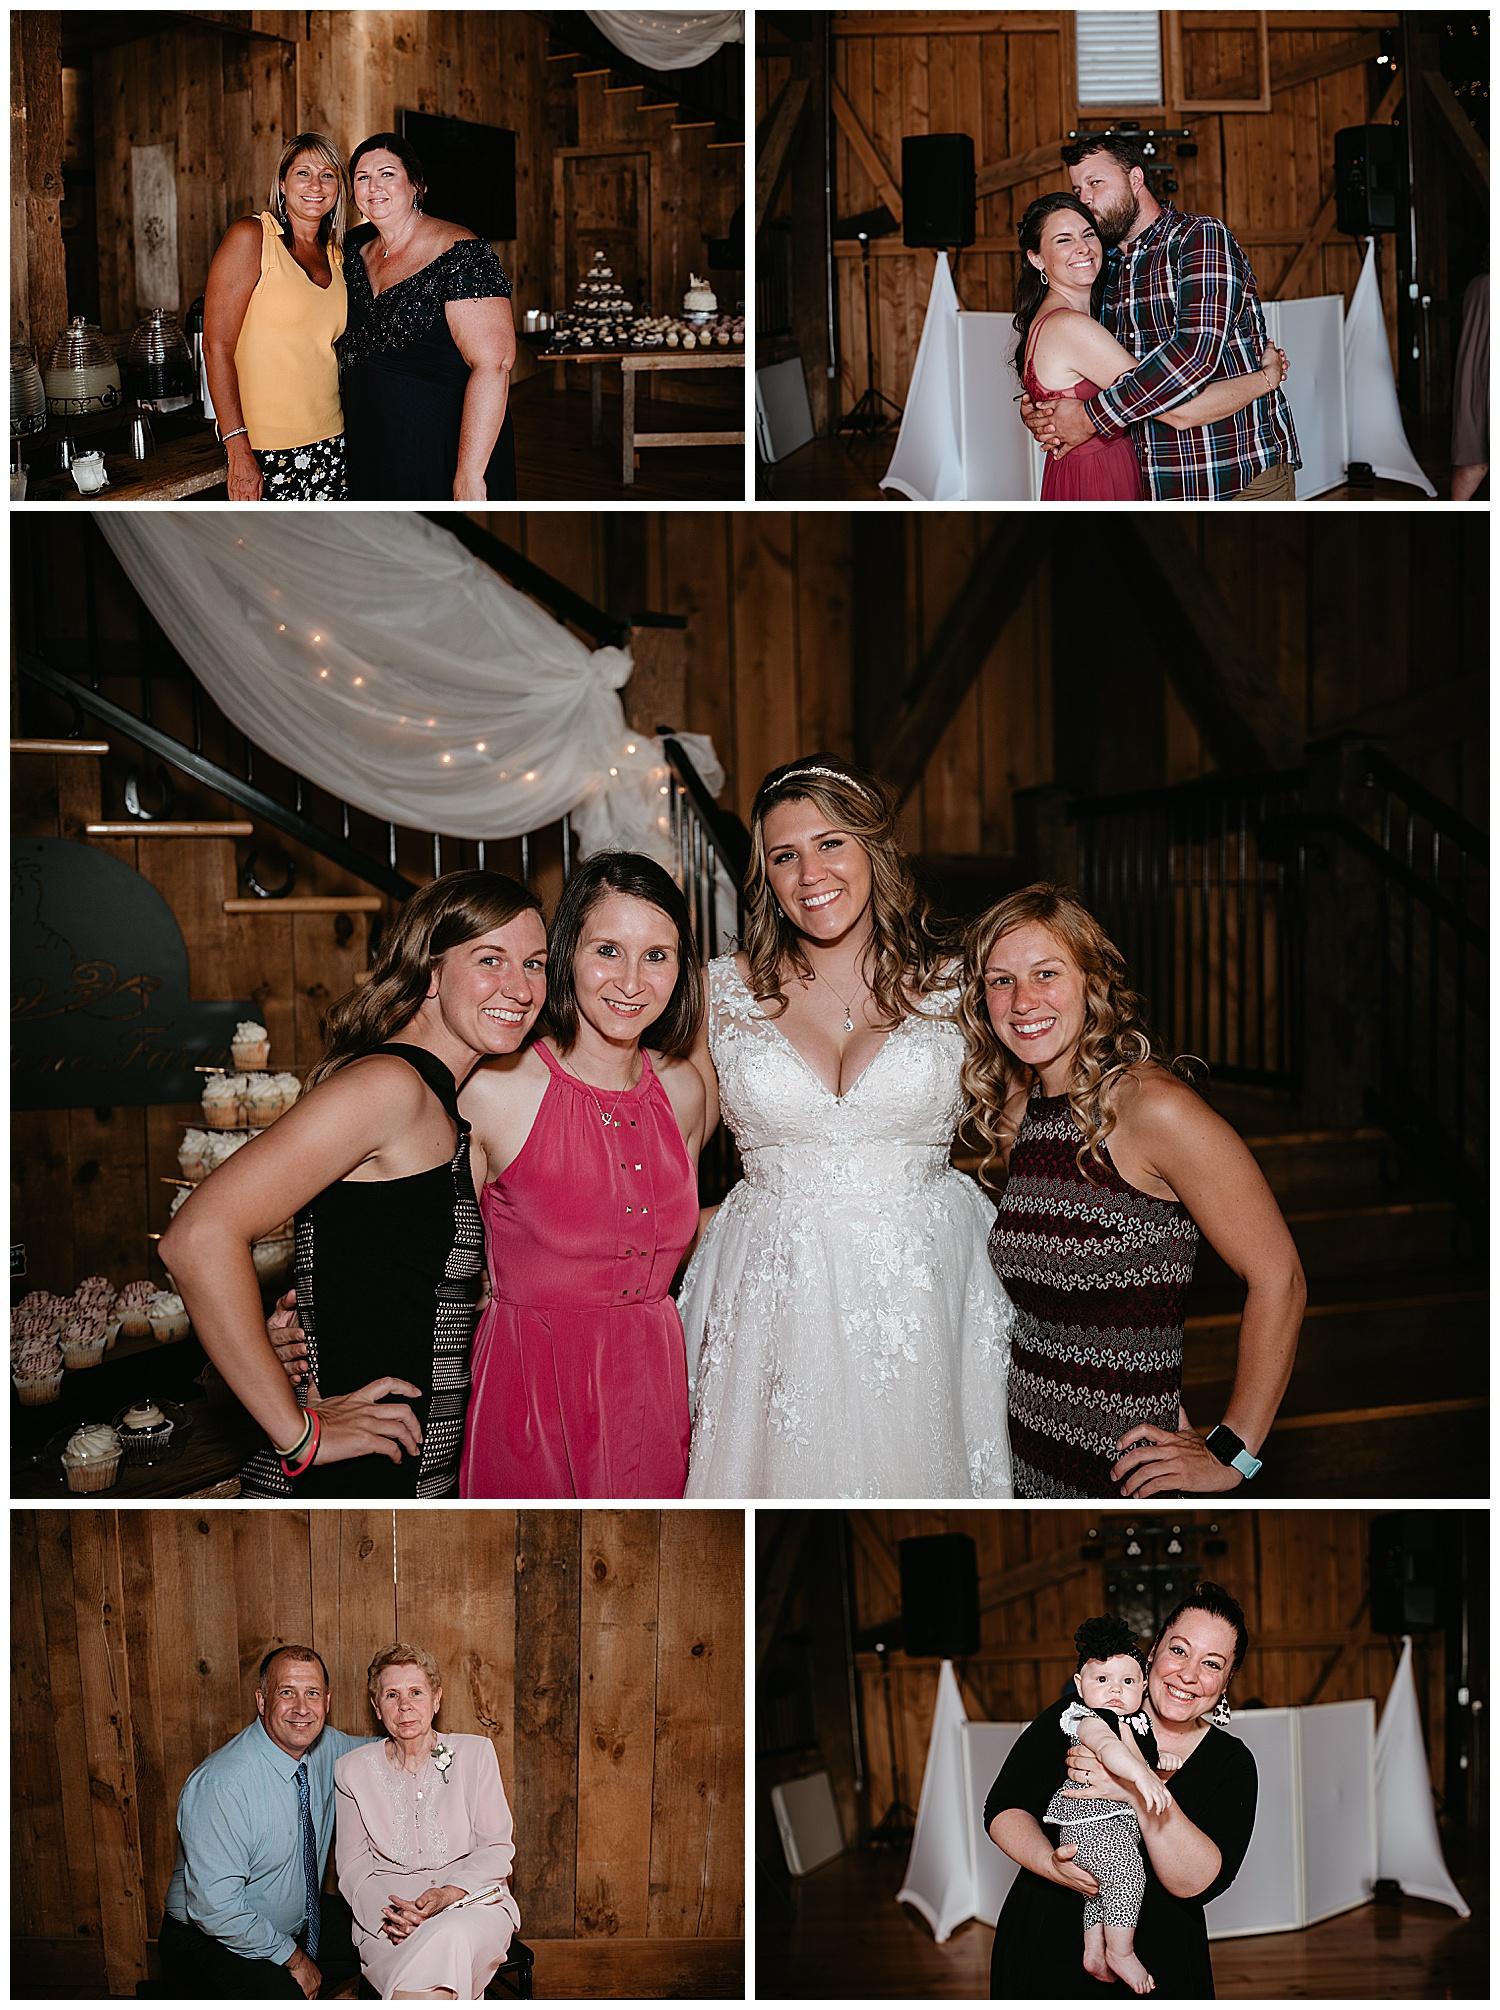 NEPA-Bloomgsburg-Wedding-Photographer-at-The-Barn-at-Greystone-Farms-Watsontown-PA_0087.jpg